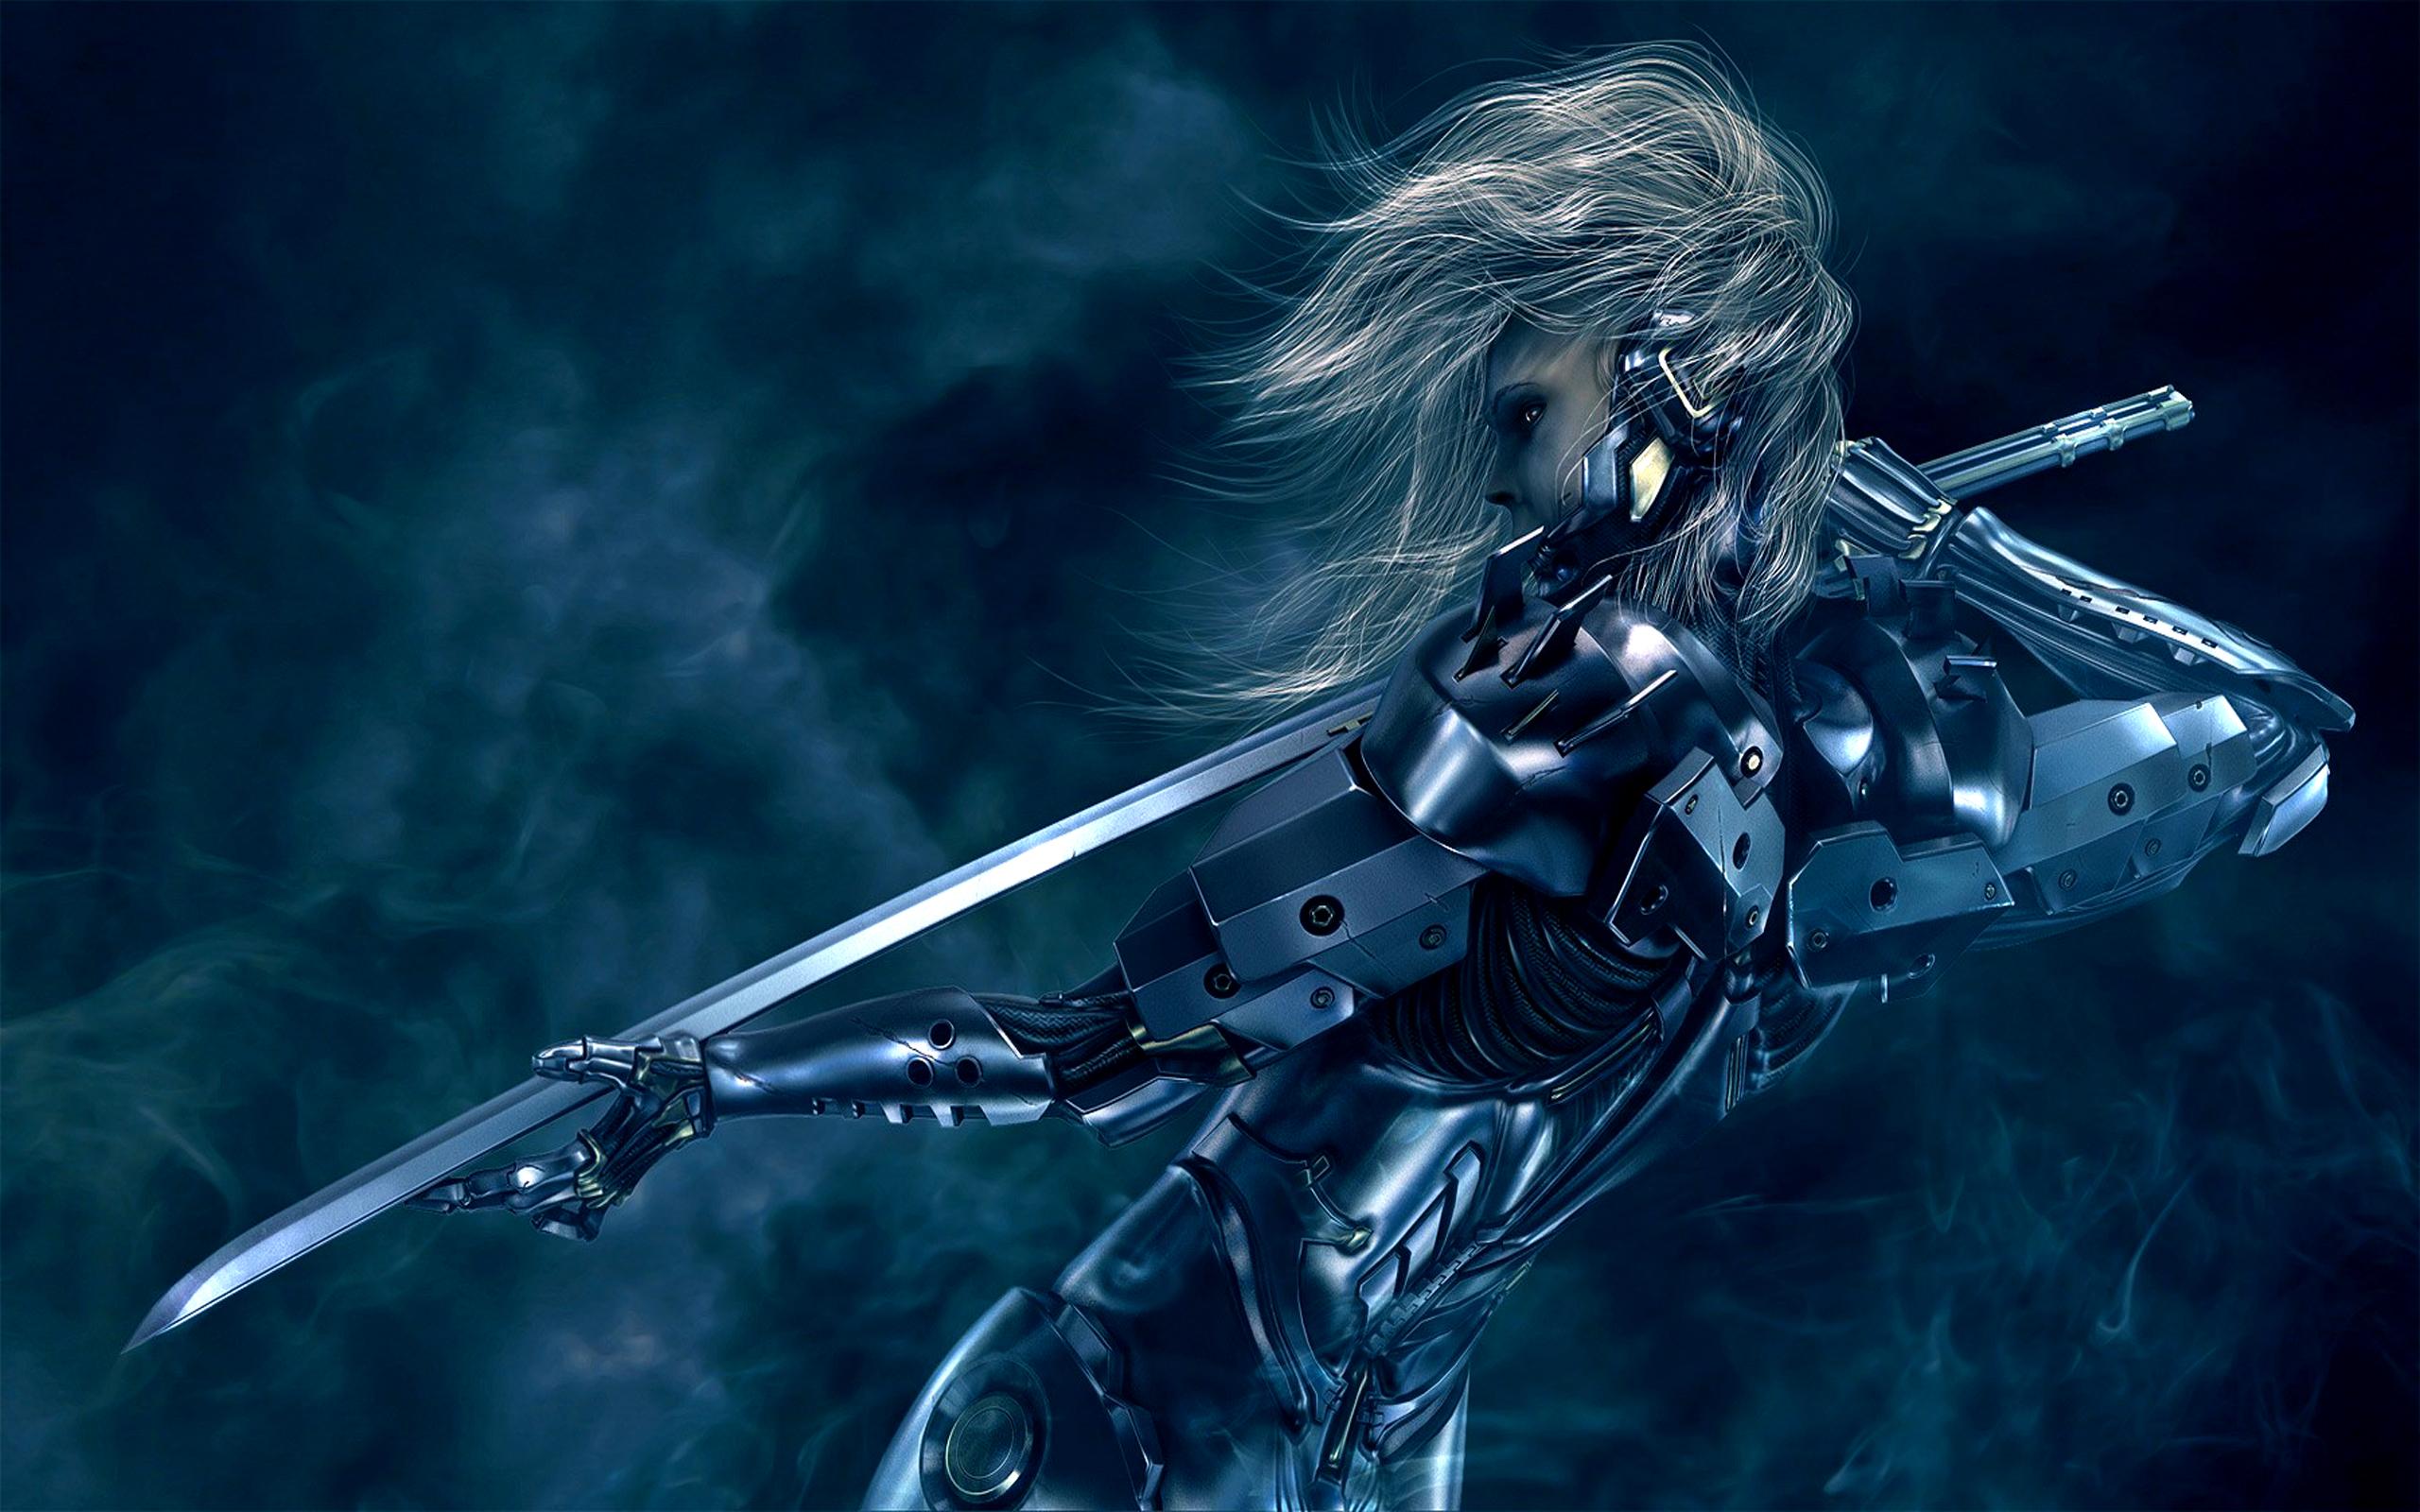 metal gear rising revengeance, cyborg, sword - wallpaper #631